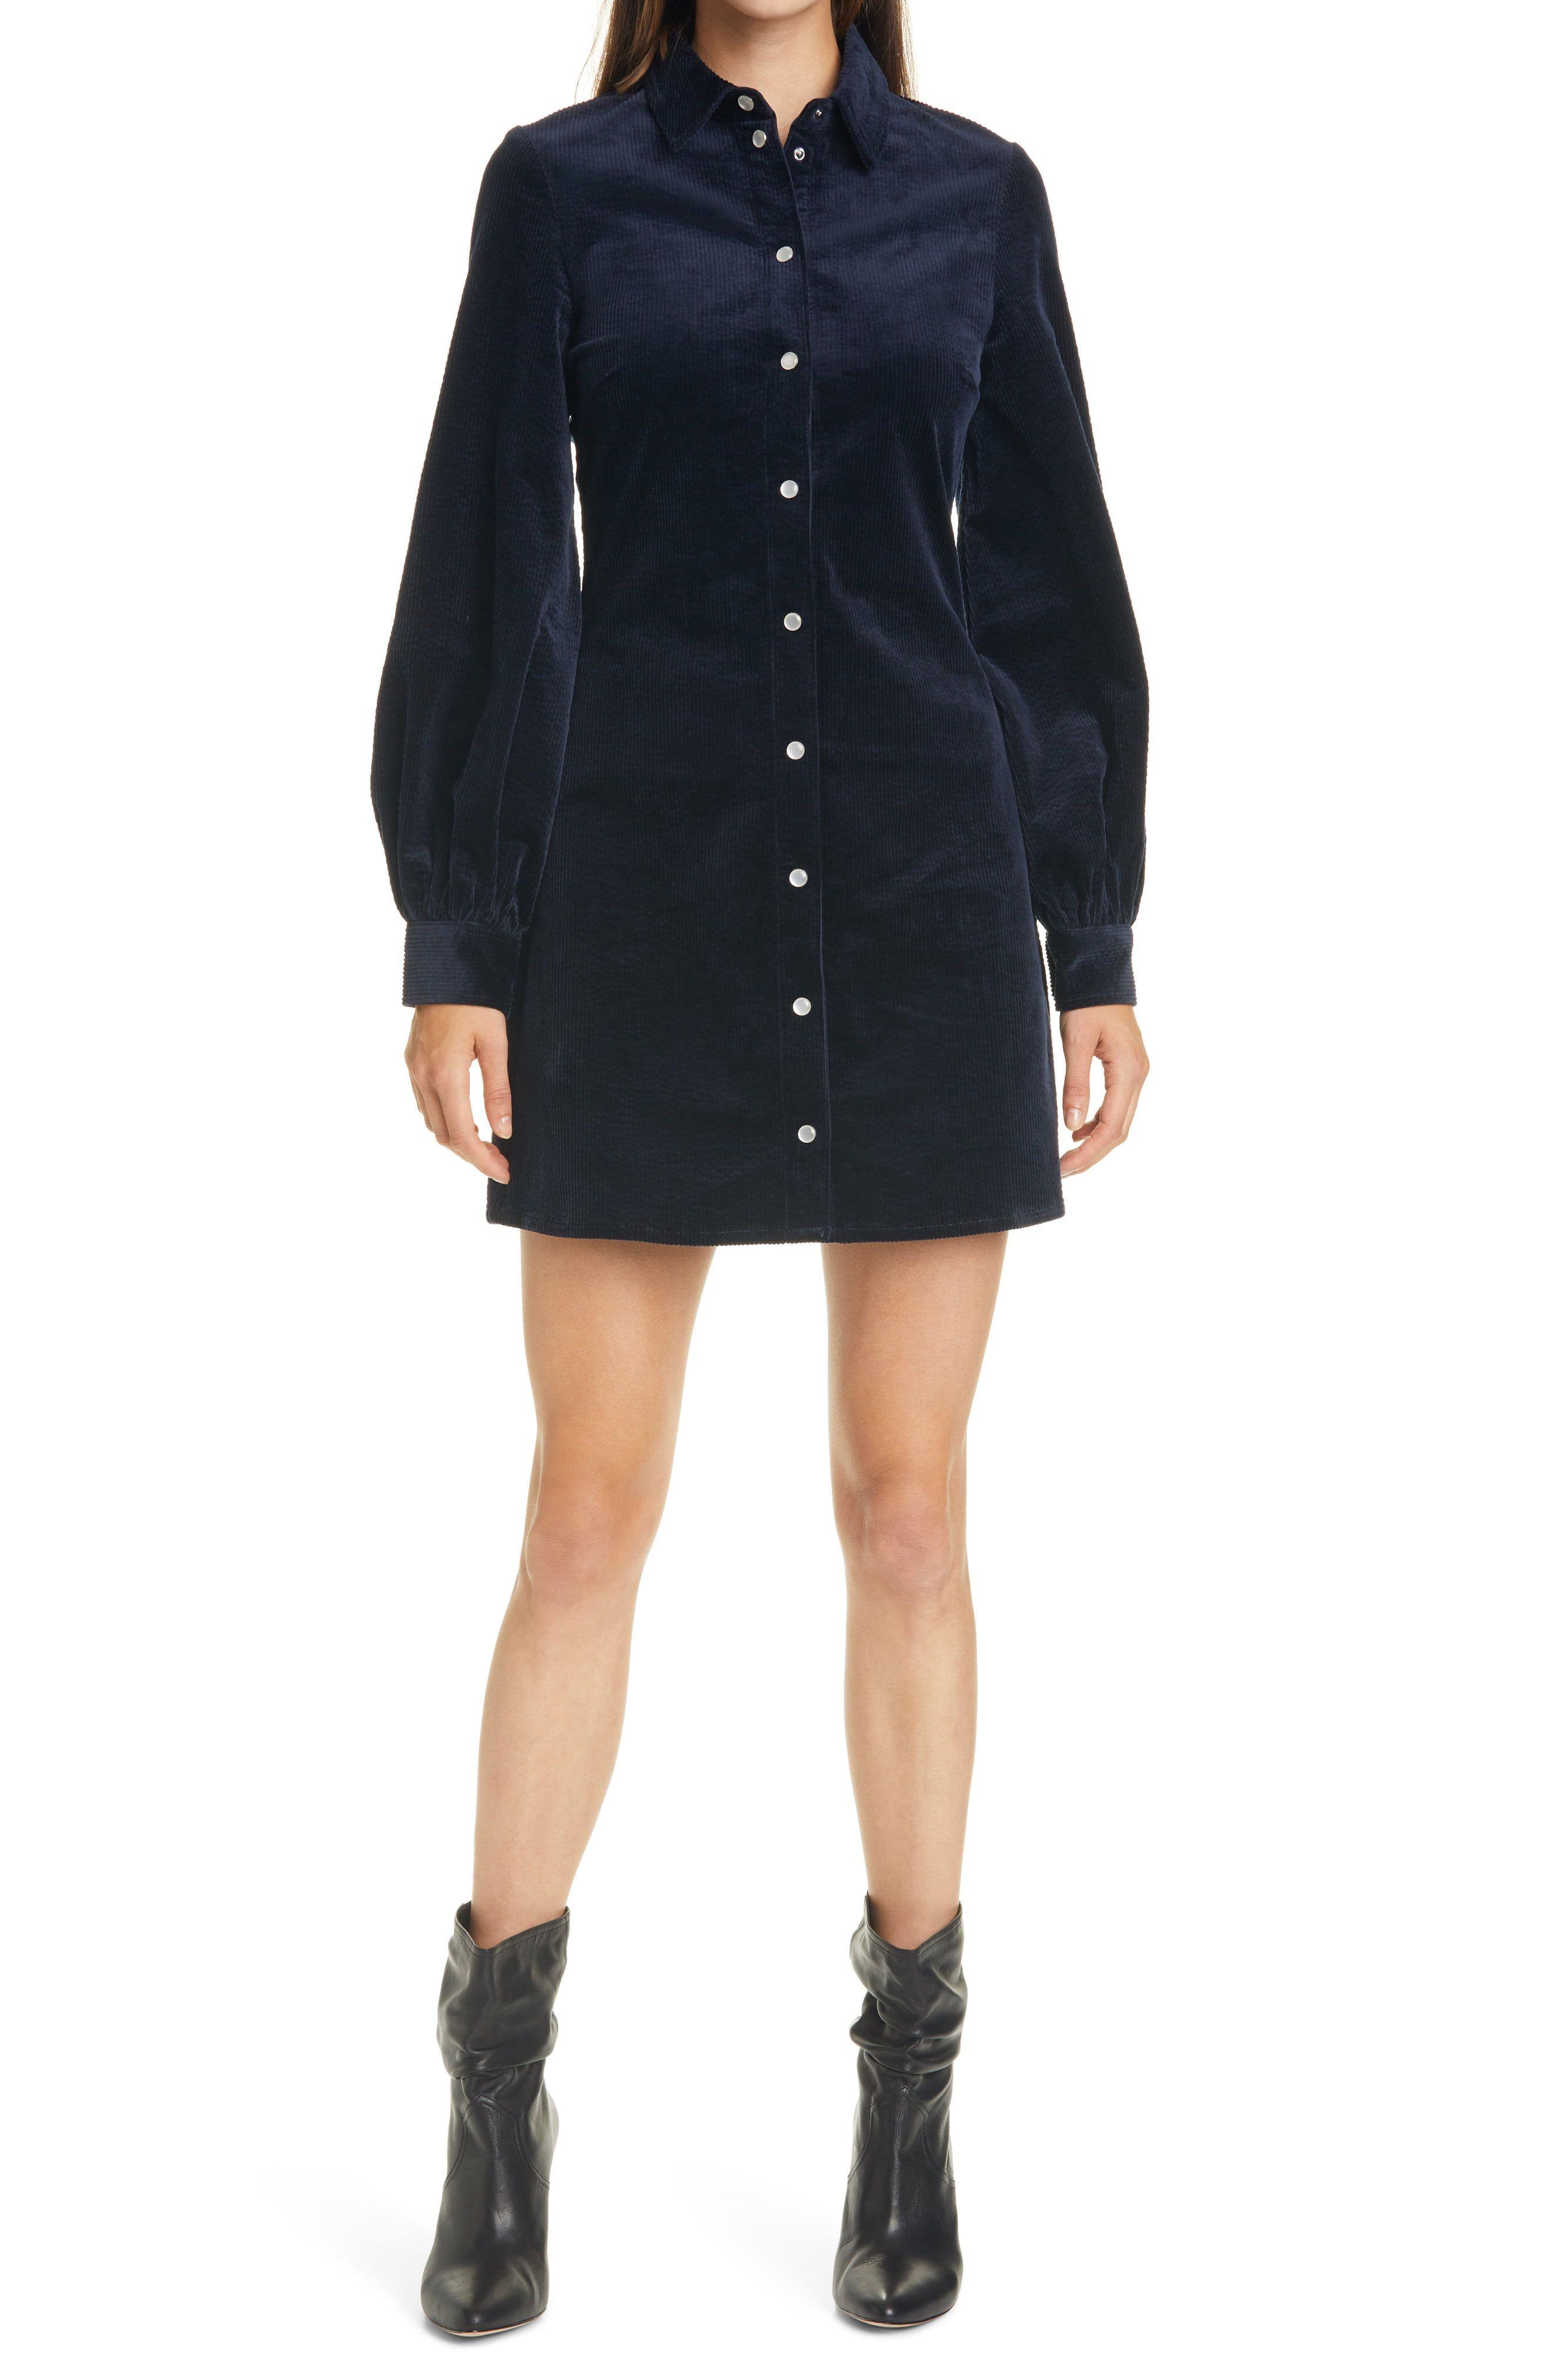 Samsoe Samsoe Moonstone Long Sleeve Corduroy Dress Nordstrom Corduroy Dress Outfit Corduroy Dress Classic Shirt Dress [ 4048 x 2640 Pixel ]